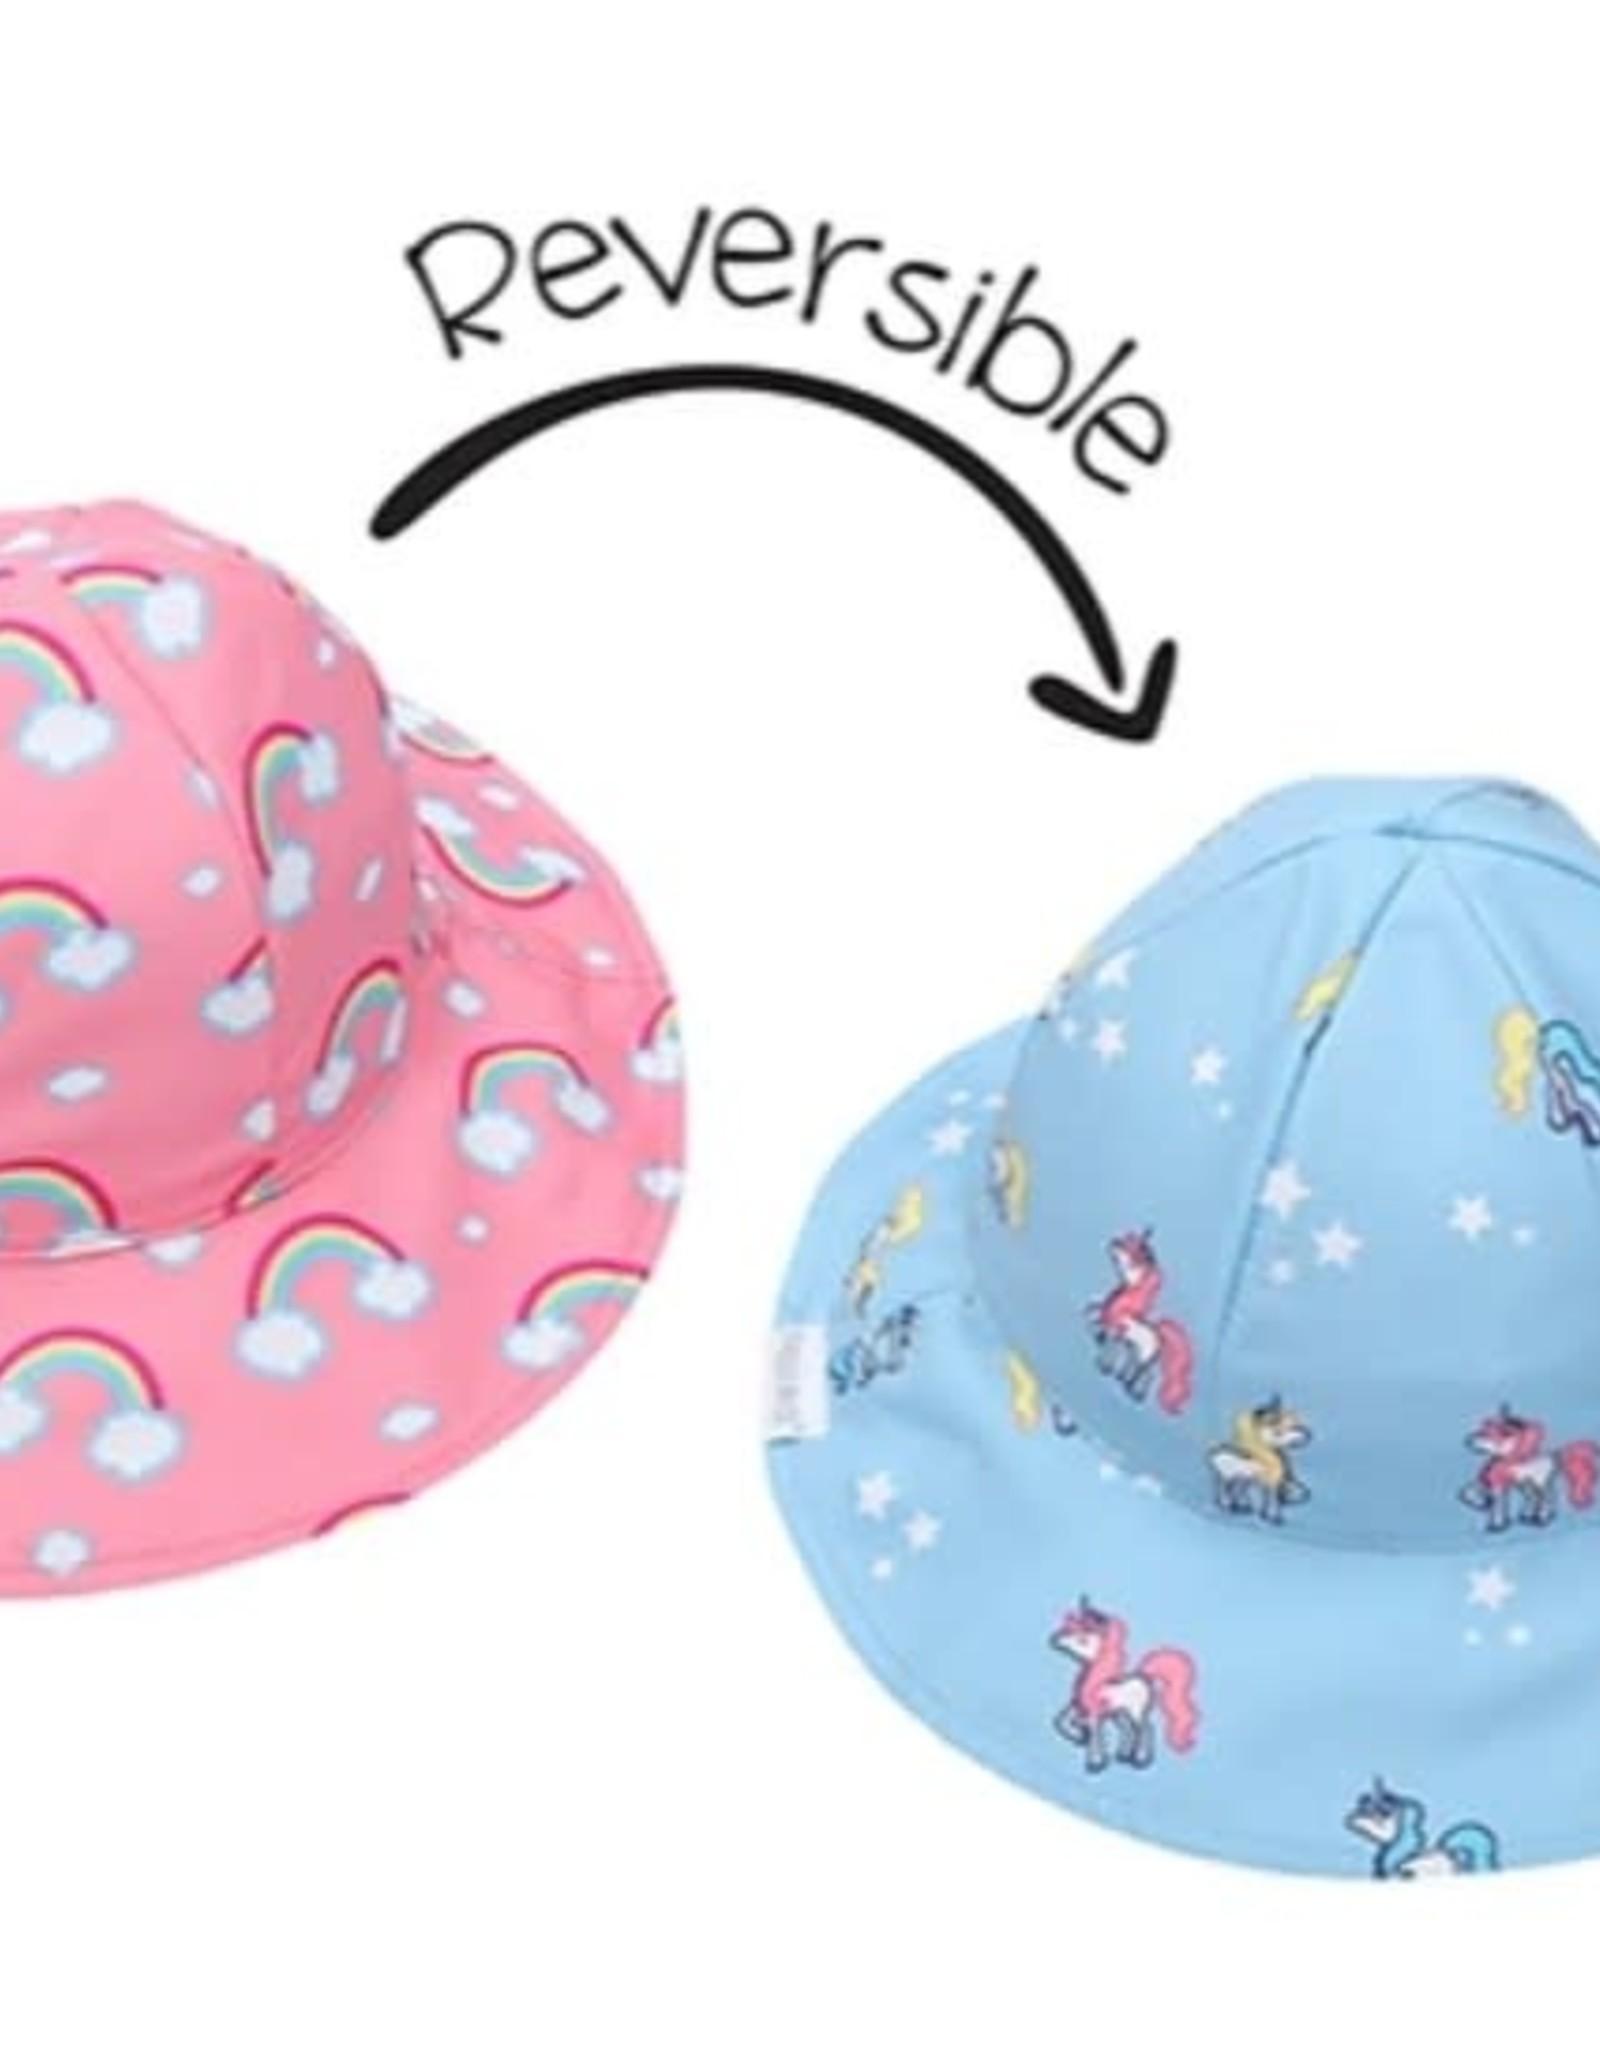 FlapJackKids Kids Reversible Sun Hat - Rainbow/Unicorn - Small (6mths - 2 yrs)